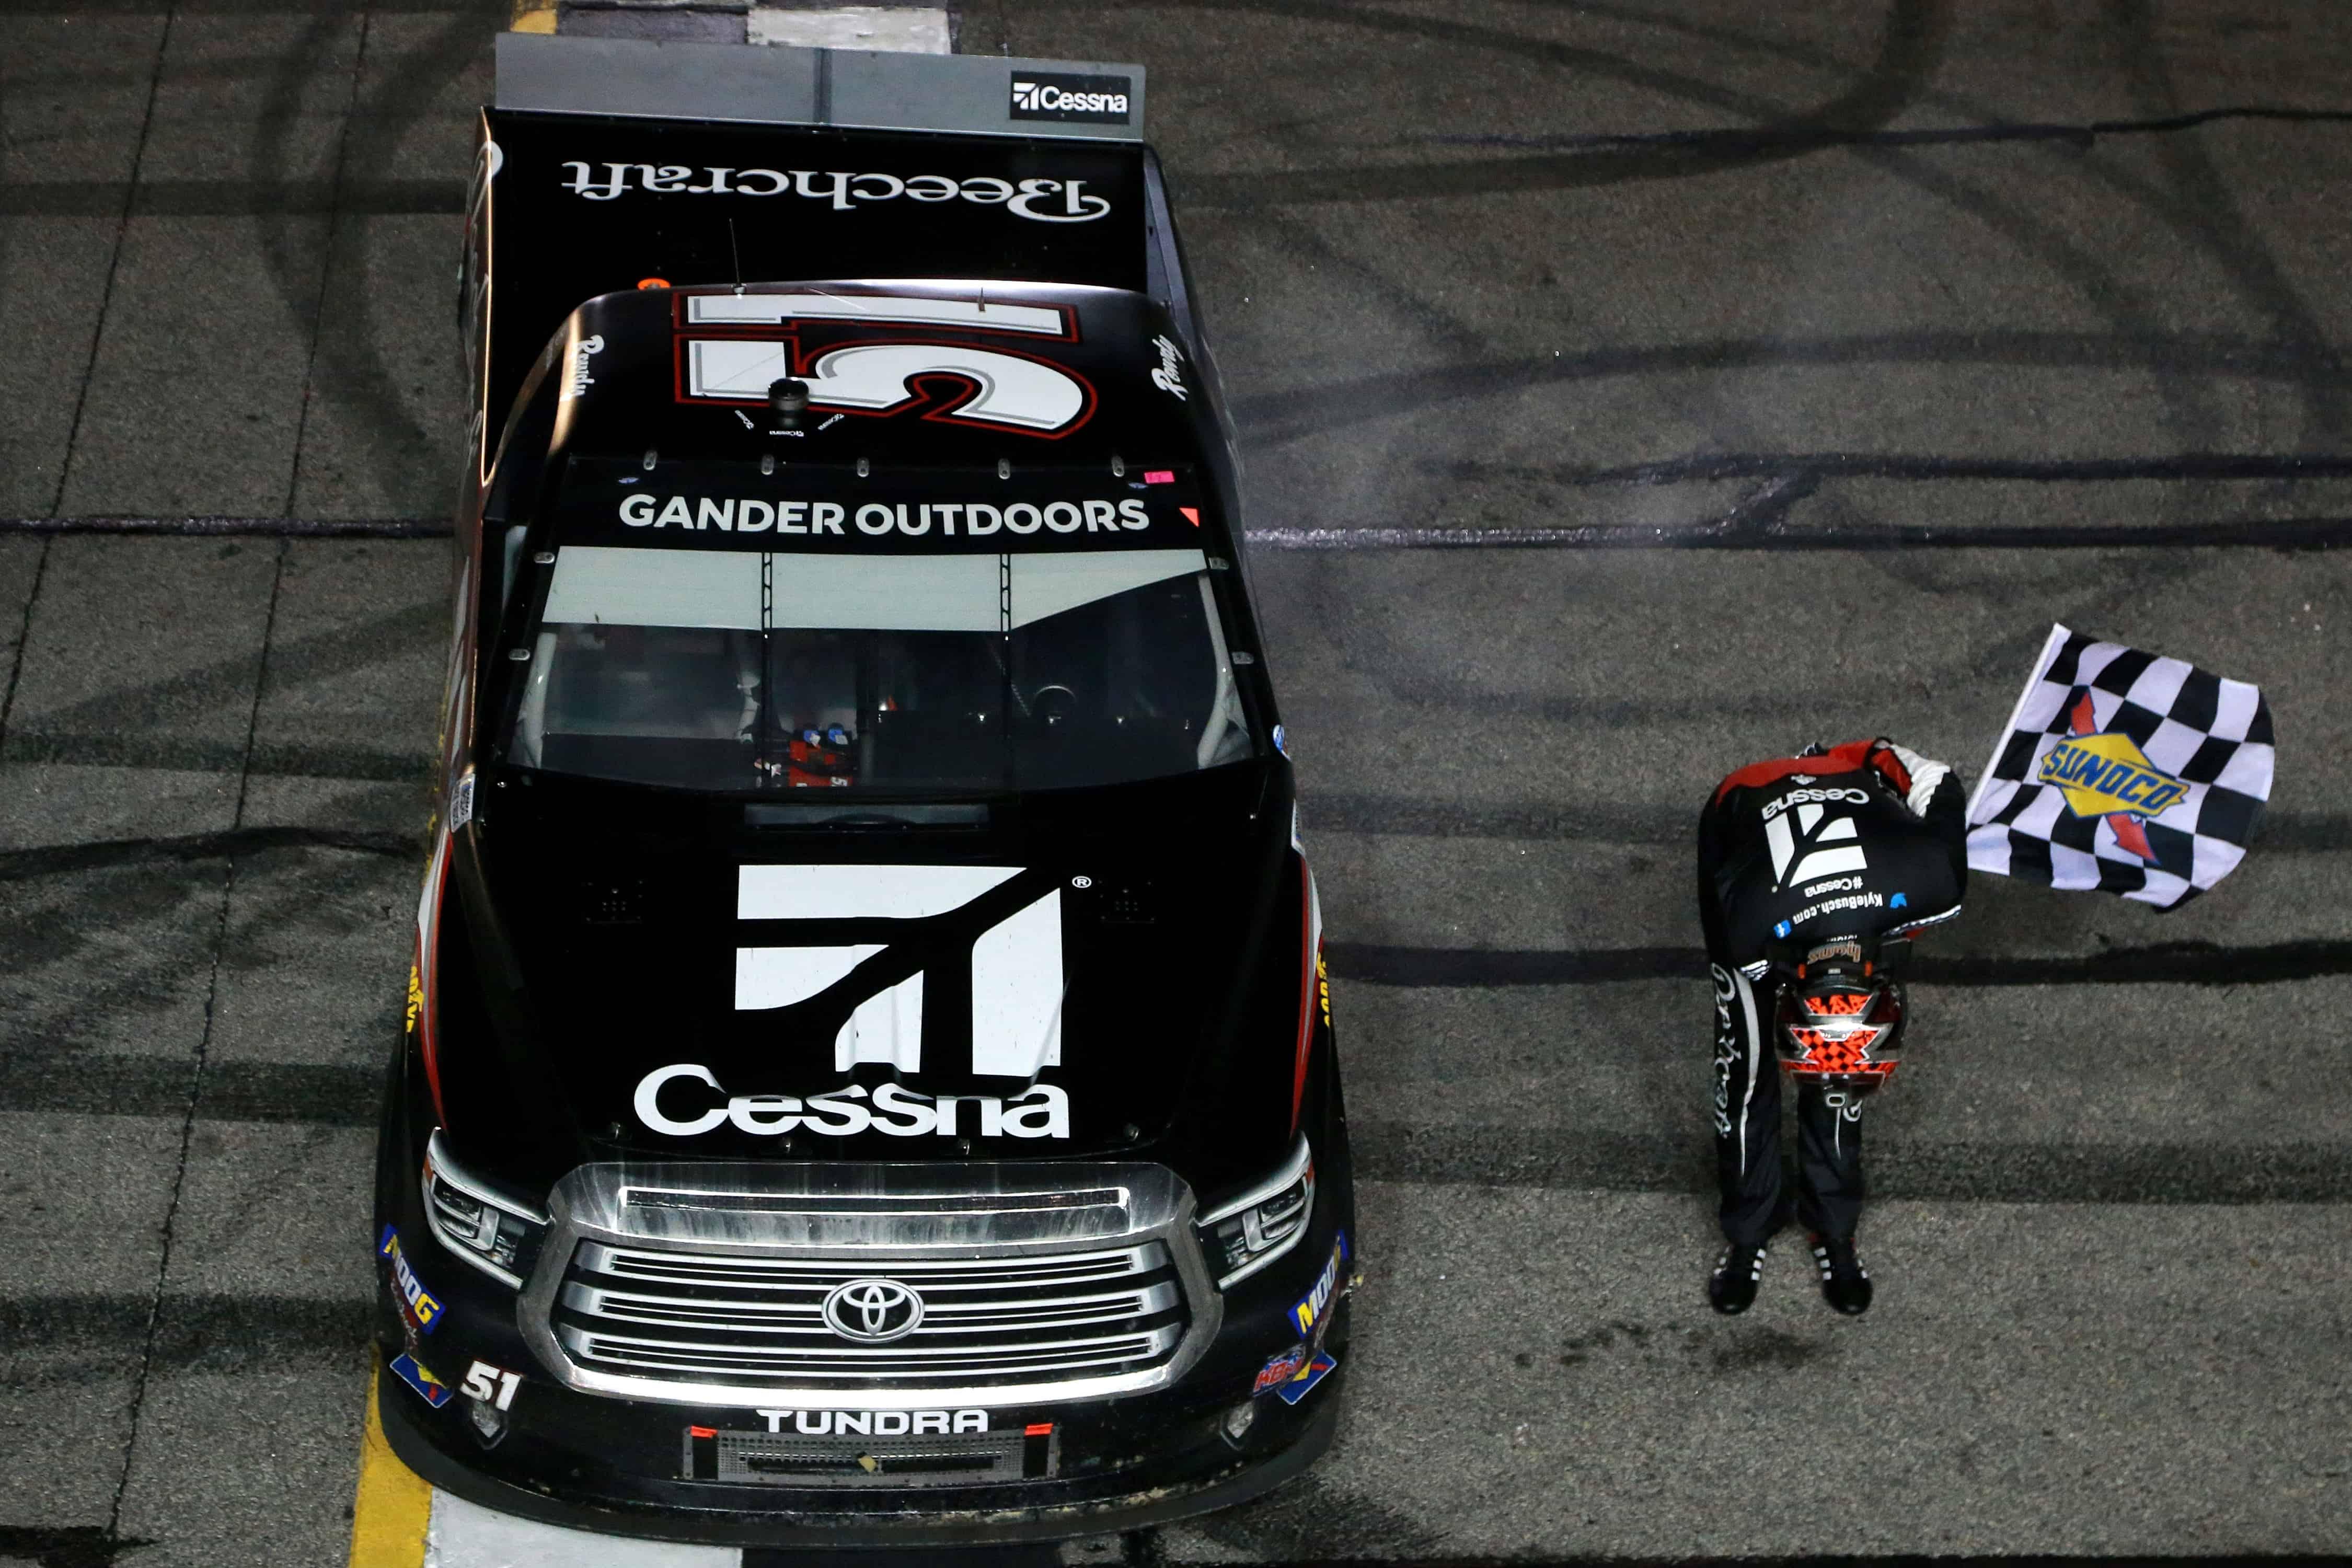 Kyle Busch wins at Atlanta Motor Speedway - NASCAR Truck Series win record